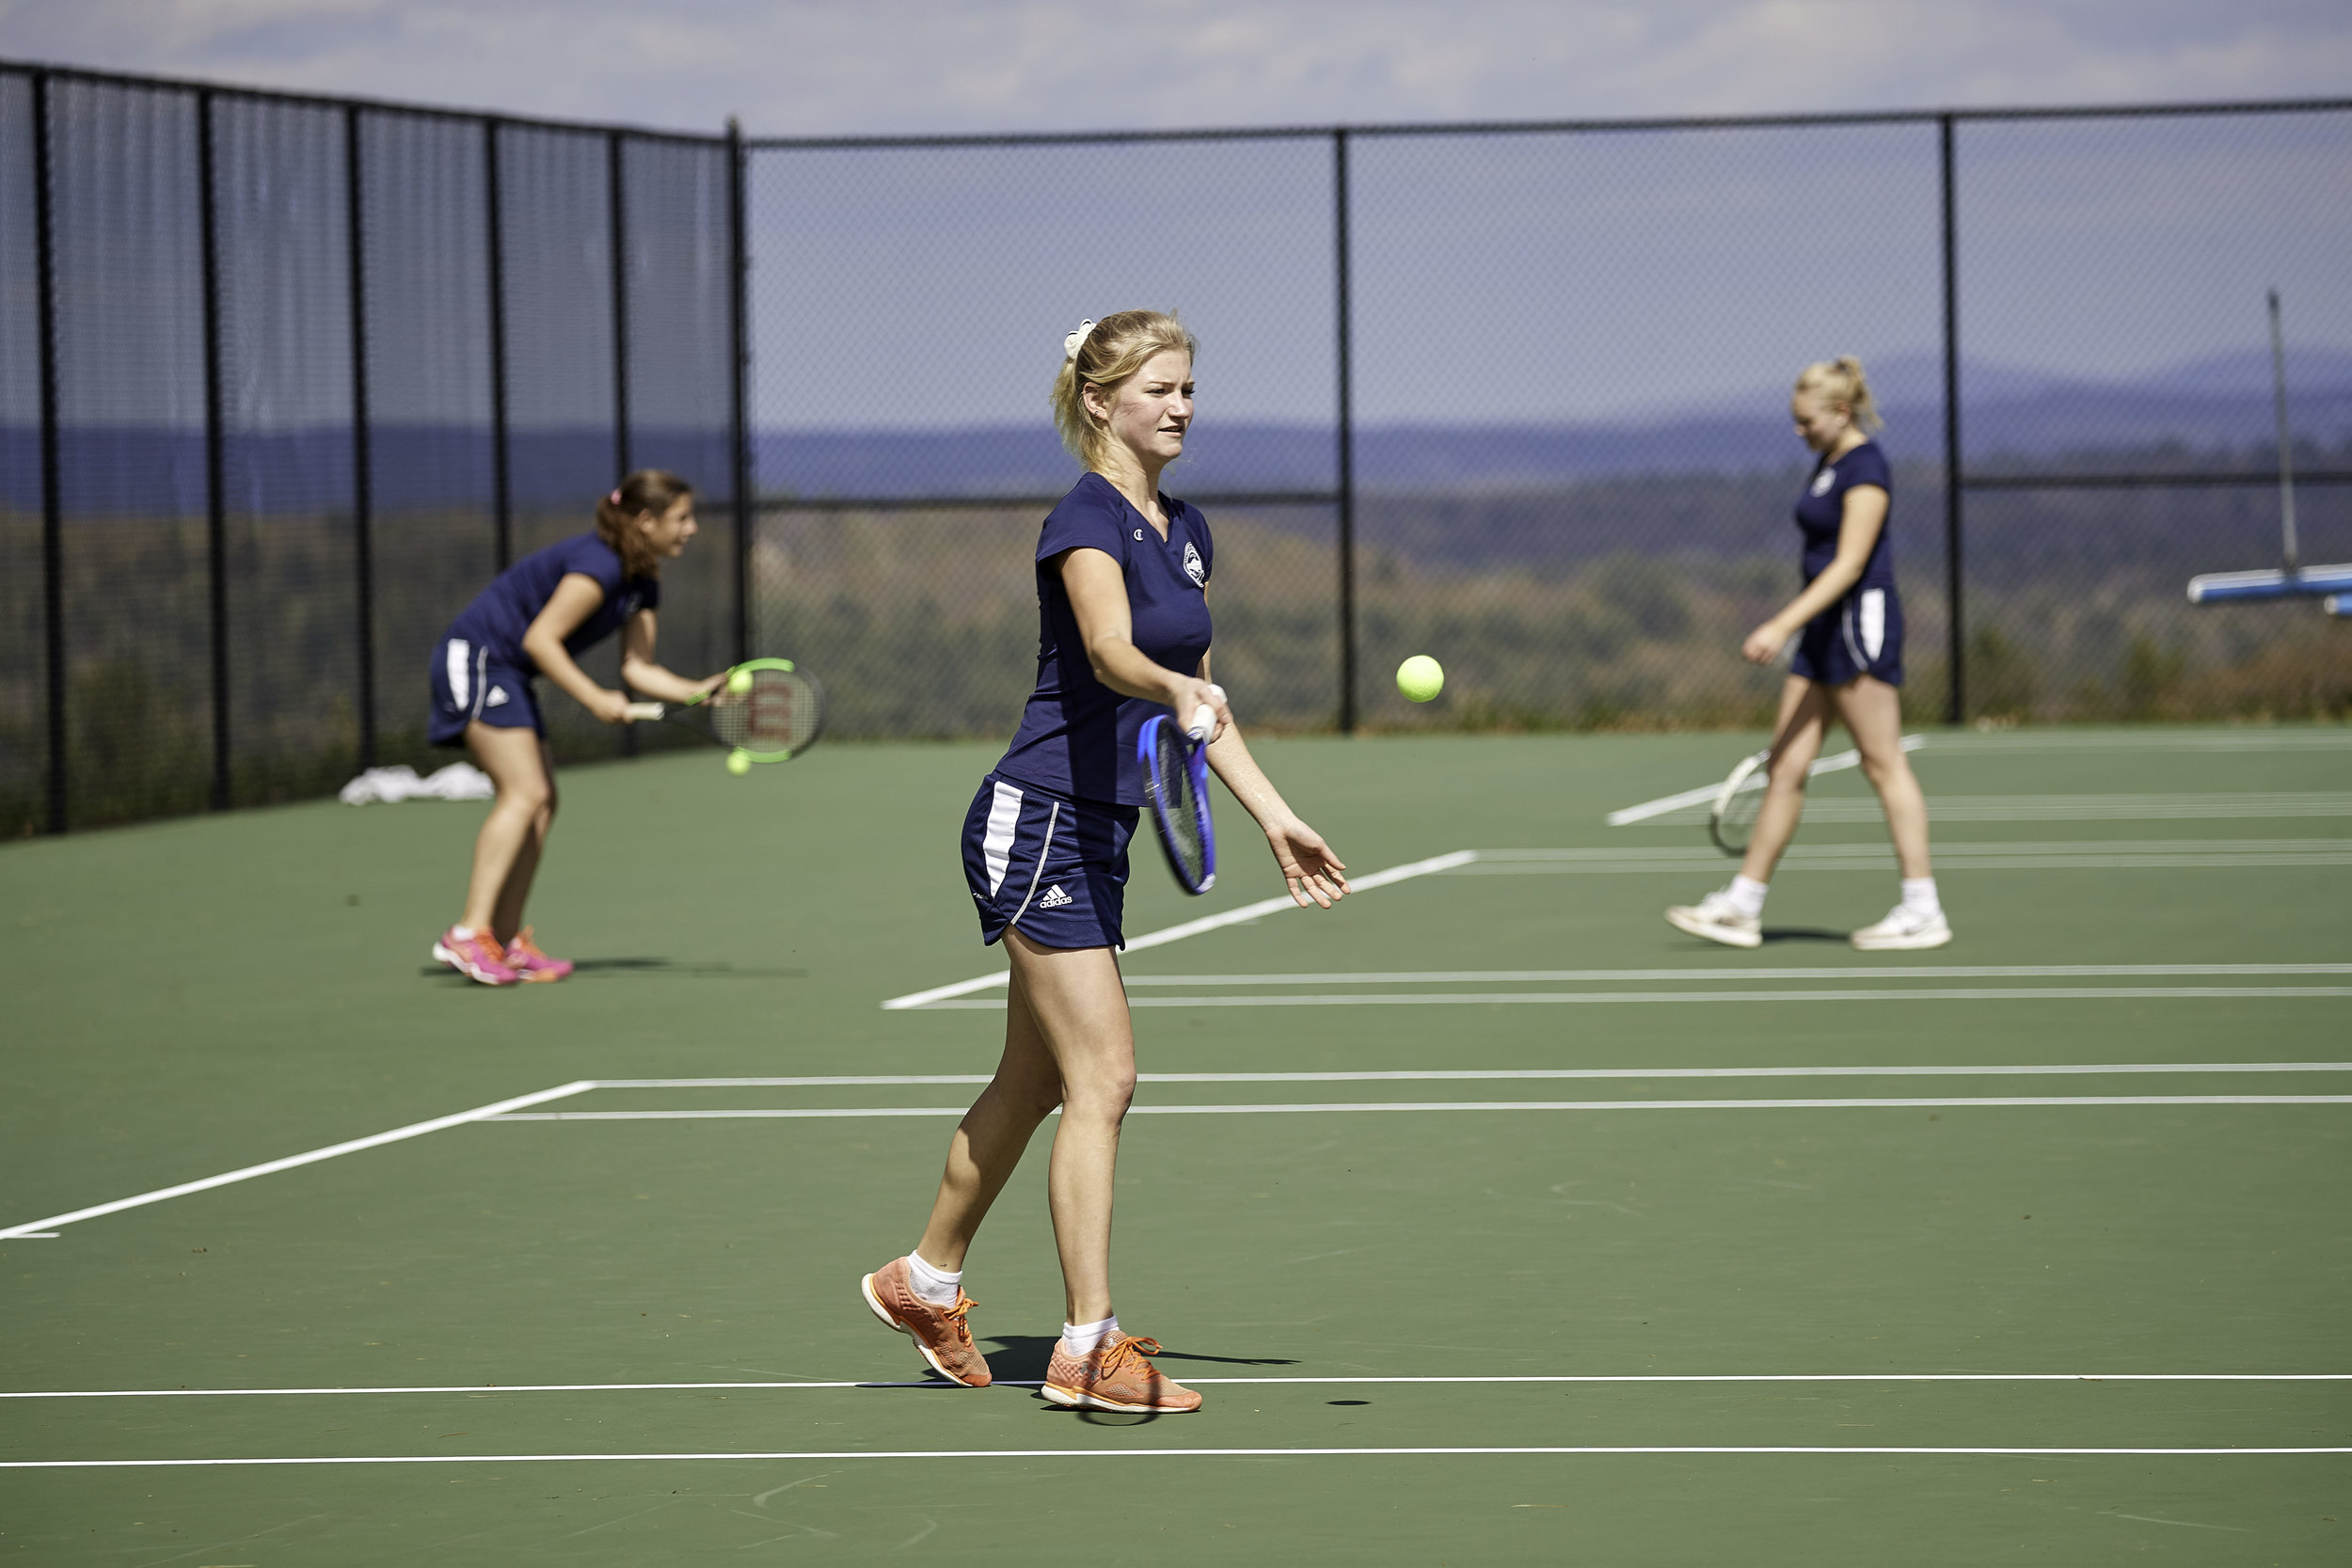 Girls Tennis vs. Winchendon School - May 15, 2019 -195193.jpg